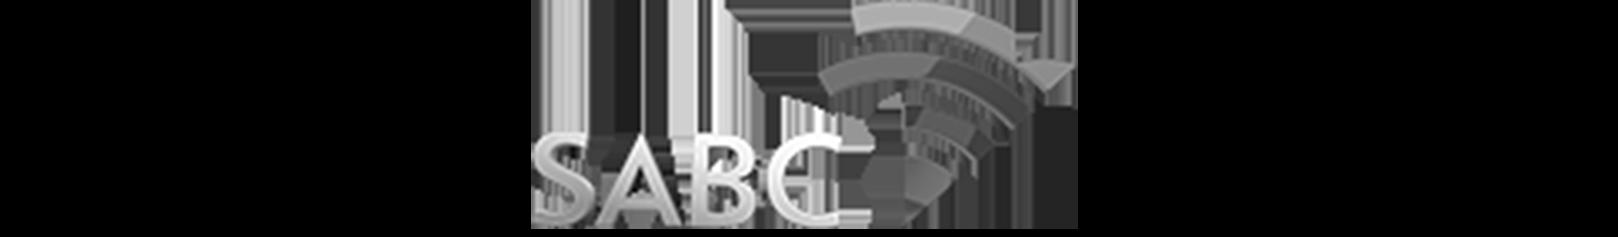 SABC_logo-grey